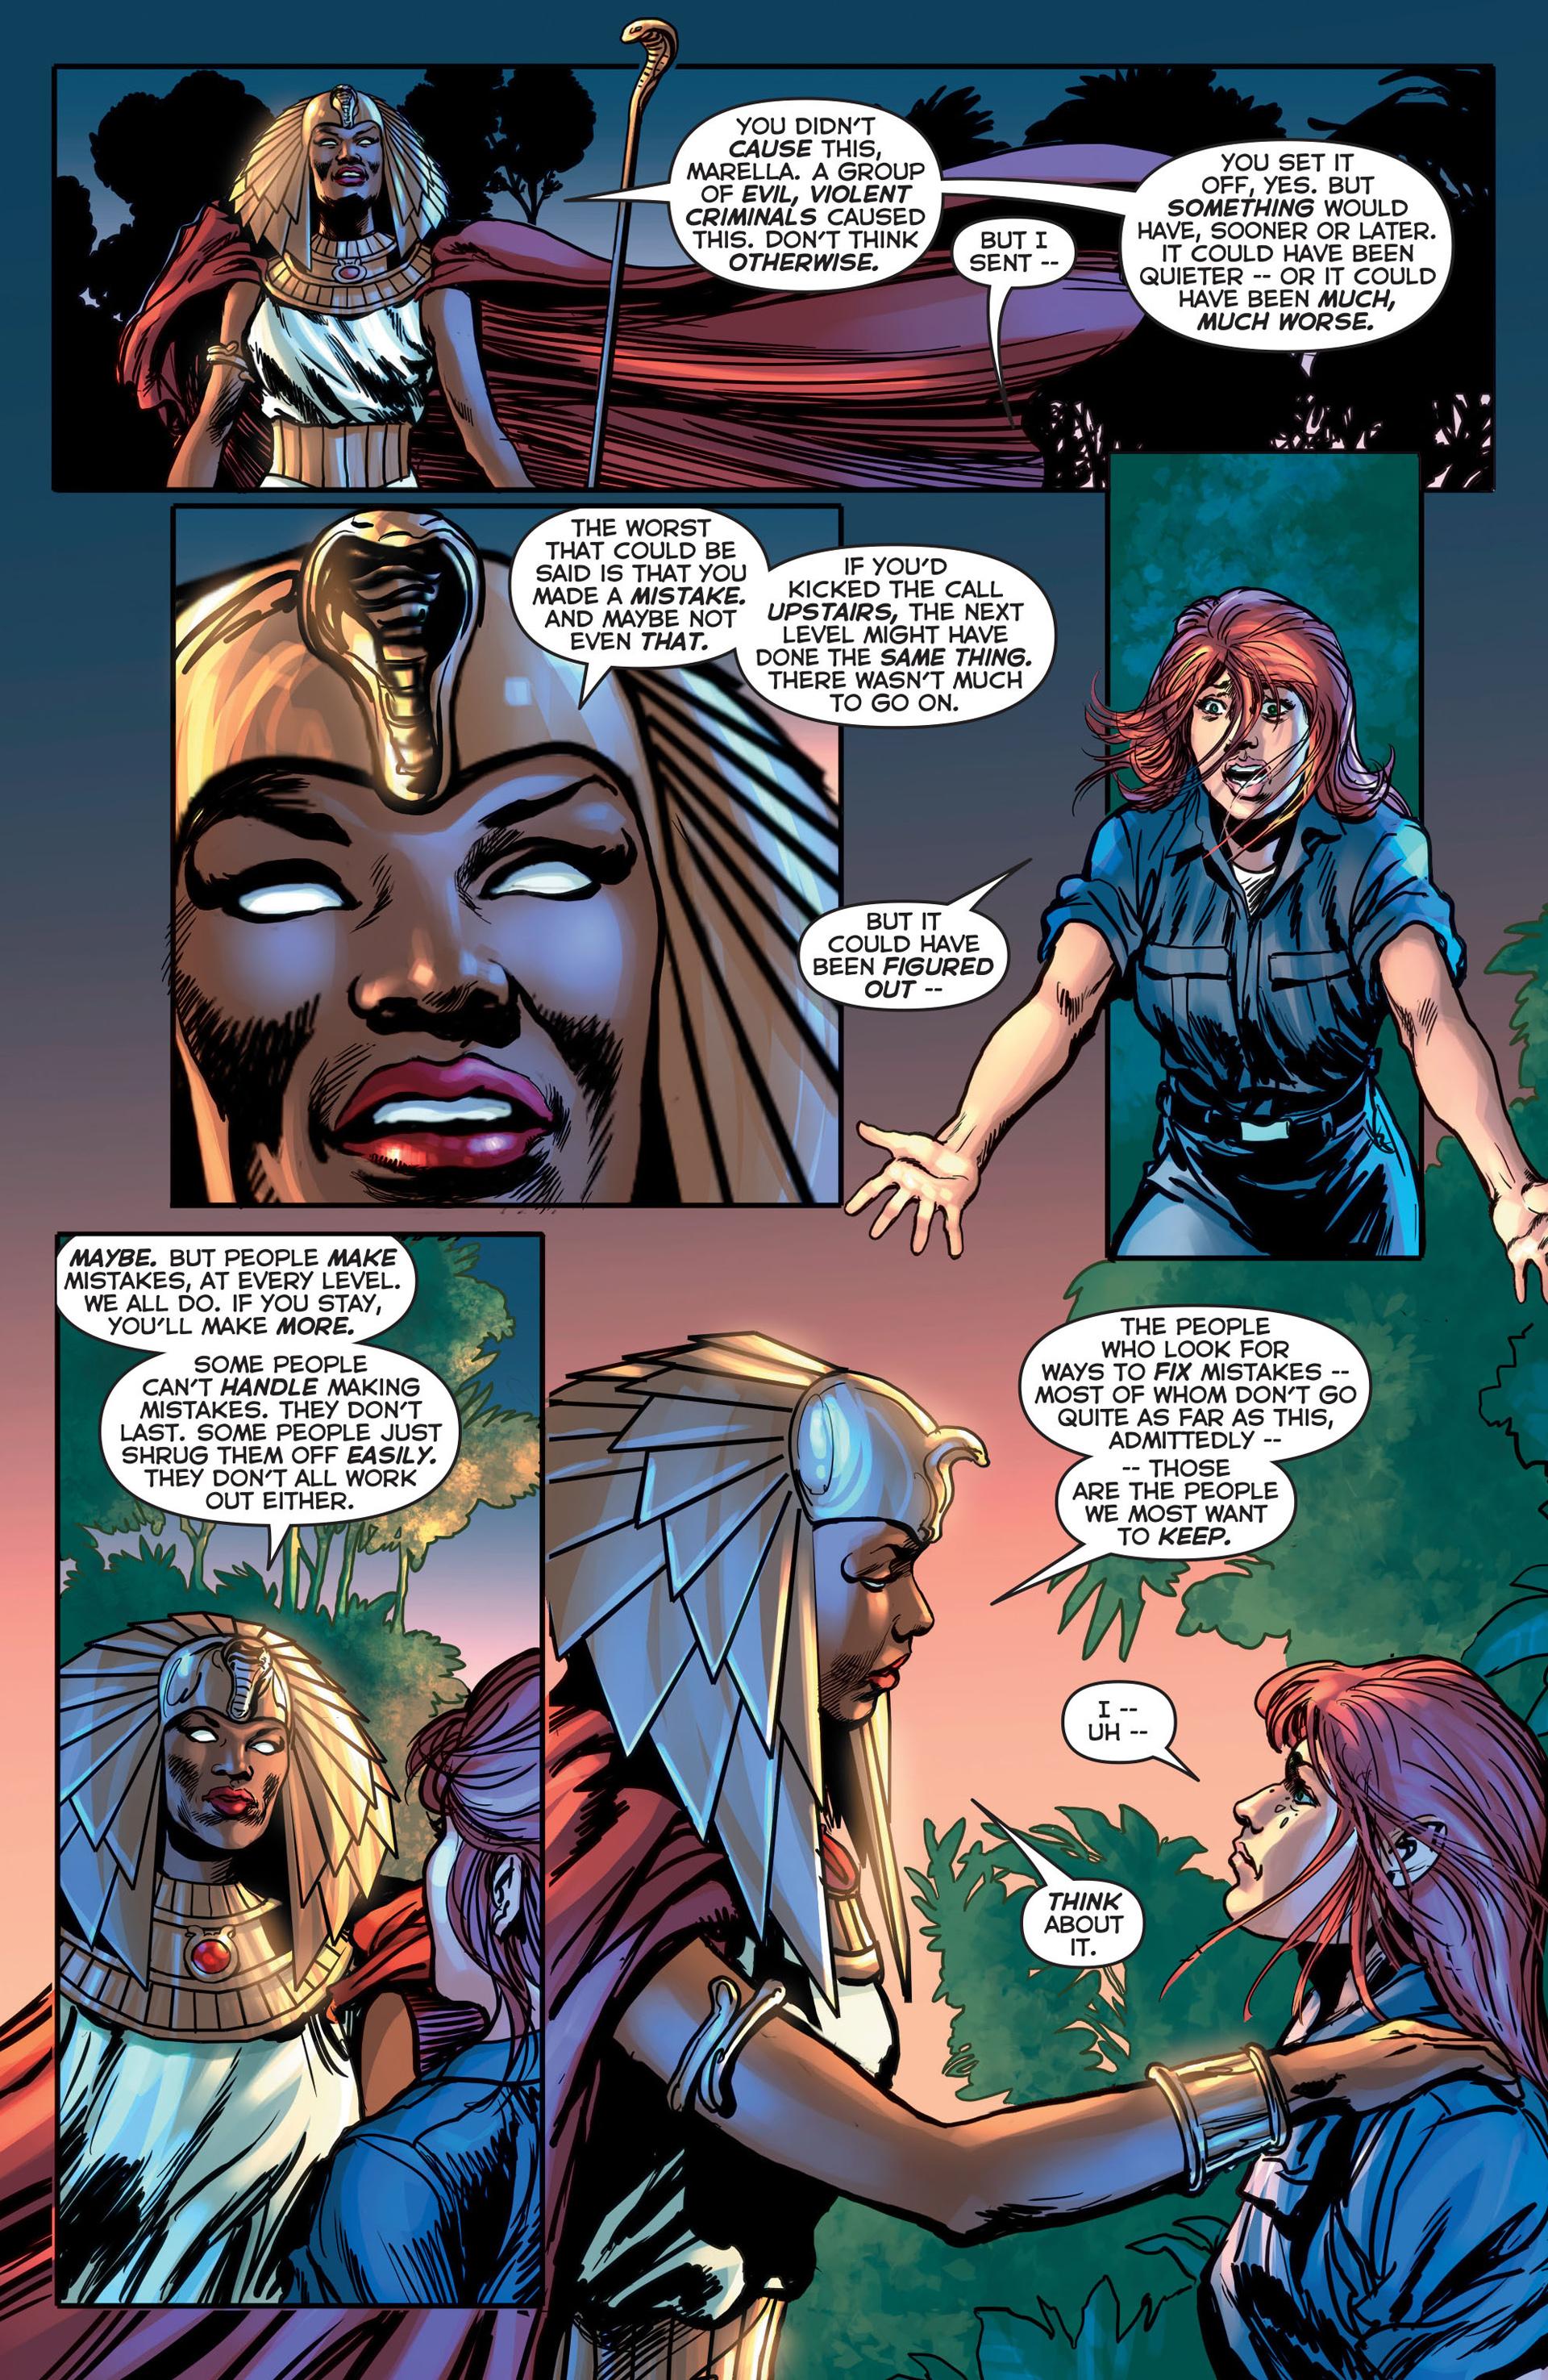 Read online Astro City comic -  Issue #3 - 23